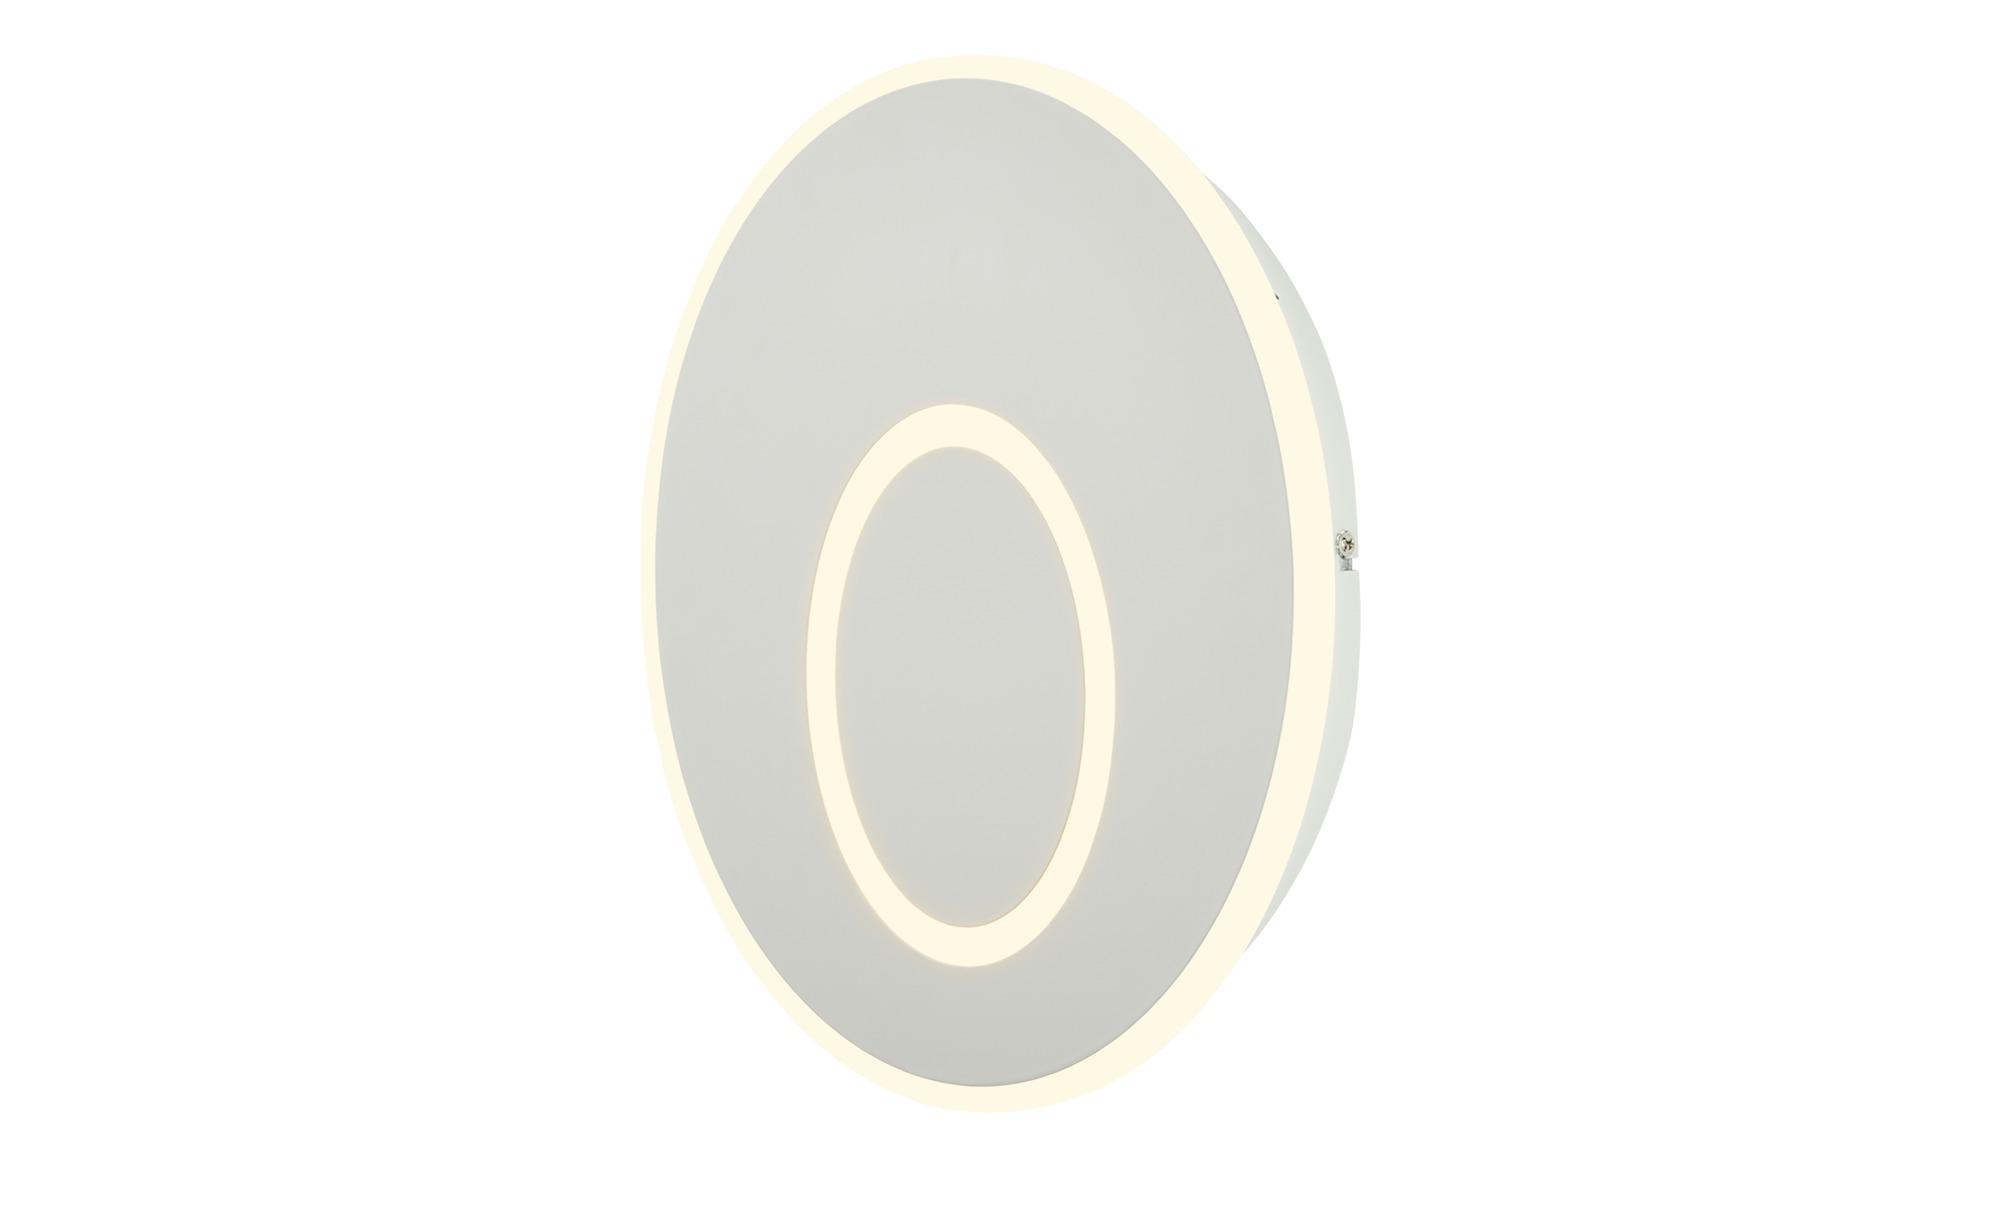 KHG LED-Wandleuchte, Weiß ¦ weiß ¦ Maße (cm): B: 32 H: 5 Lampen & Leuchten > Innenleuchten > Wandleuchten - Höffner